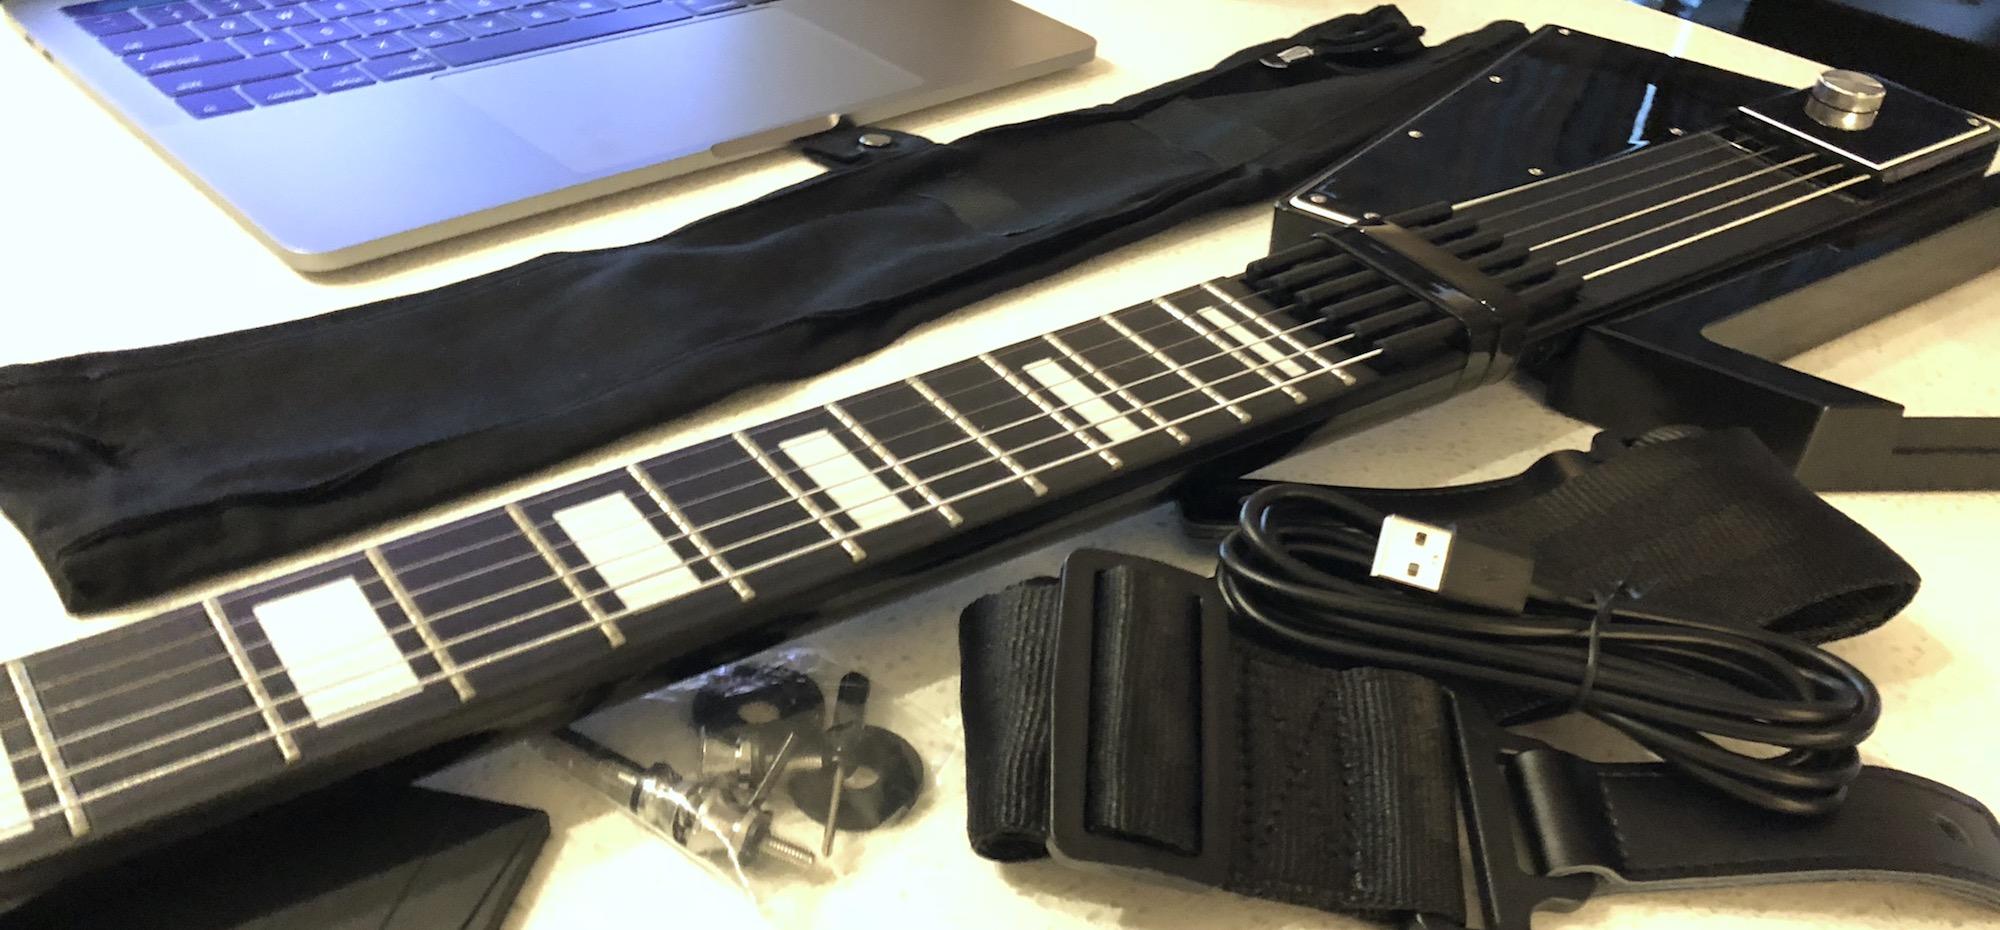 Jammy Digital Guitar hands-on